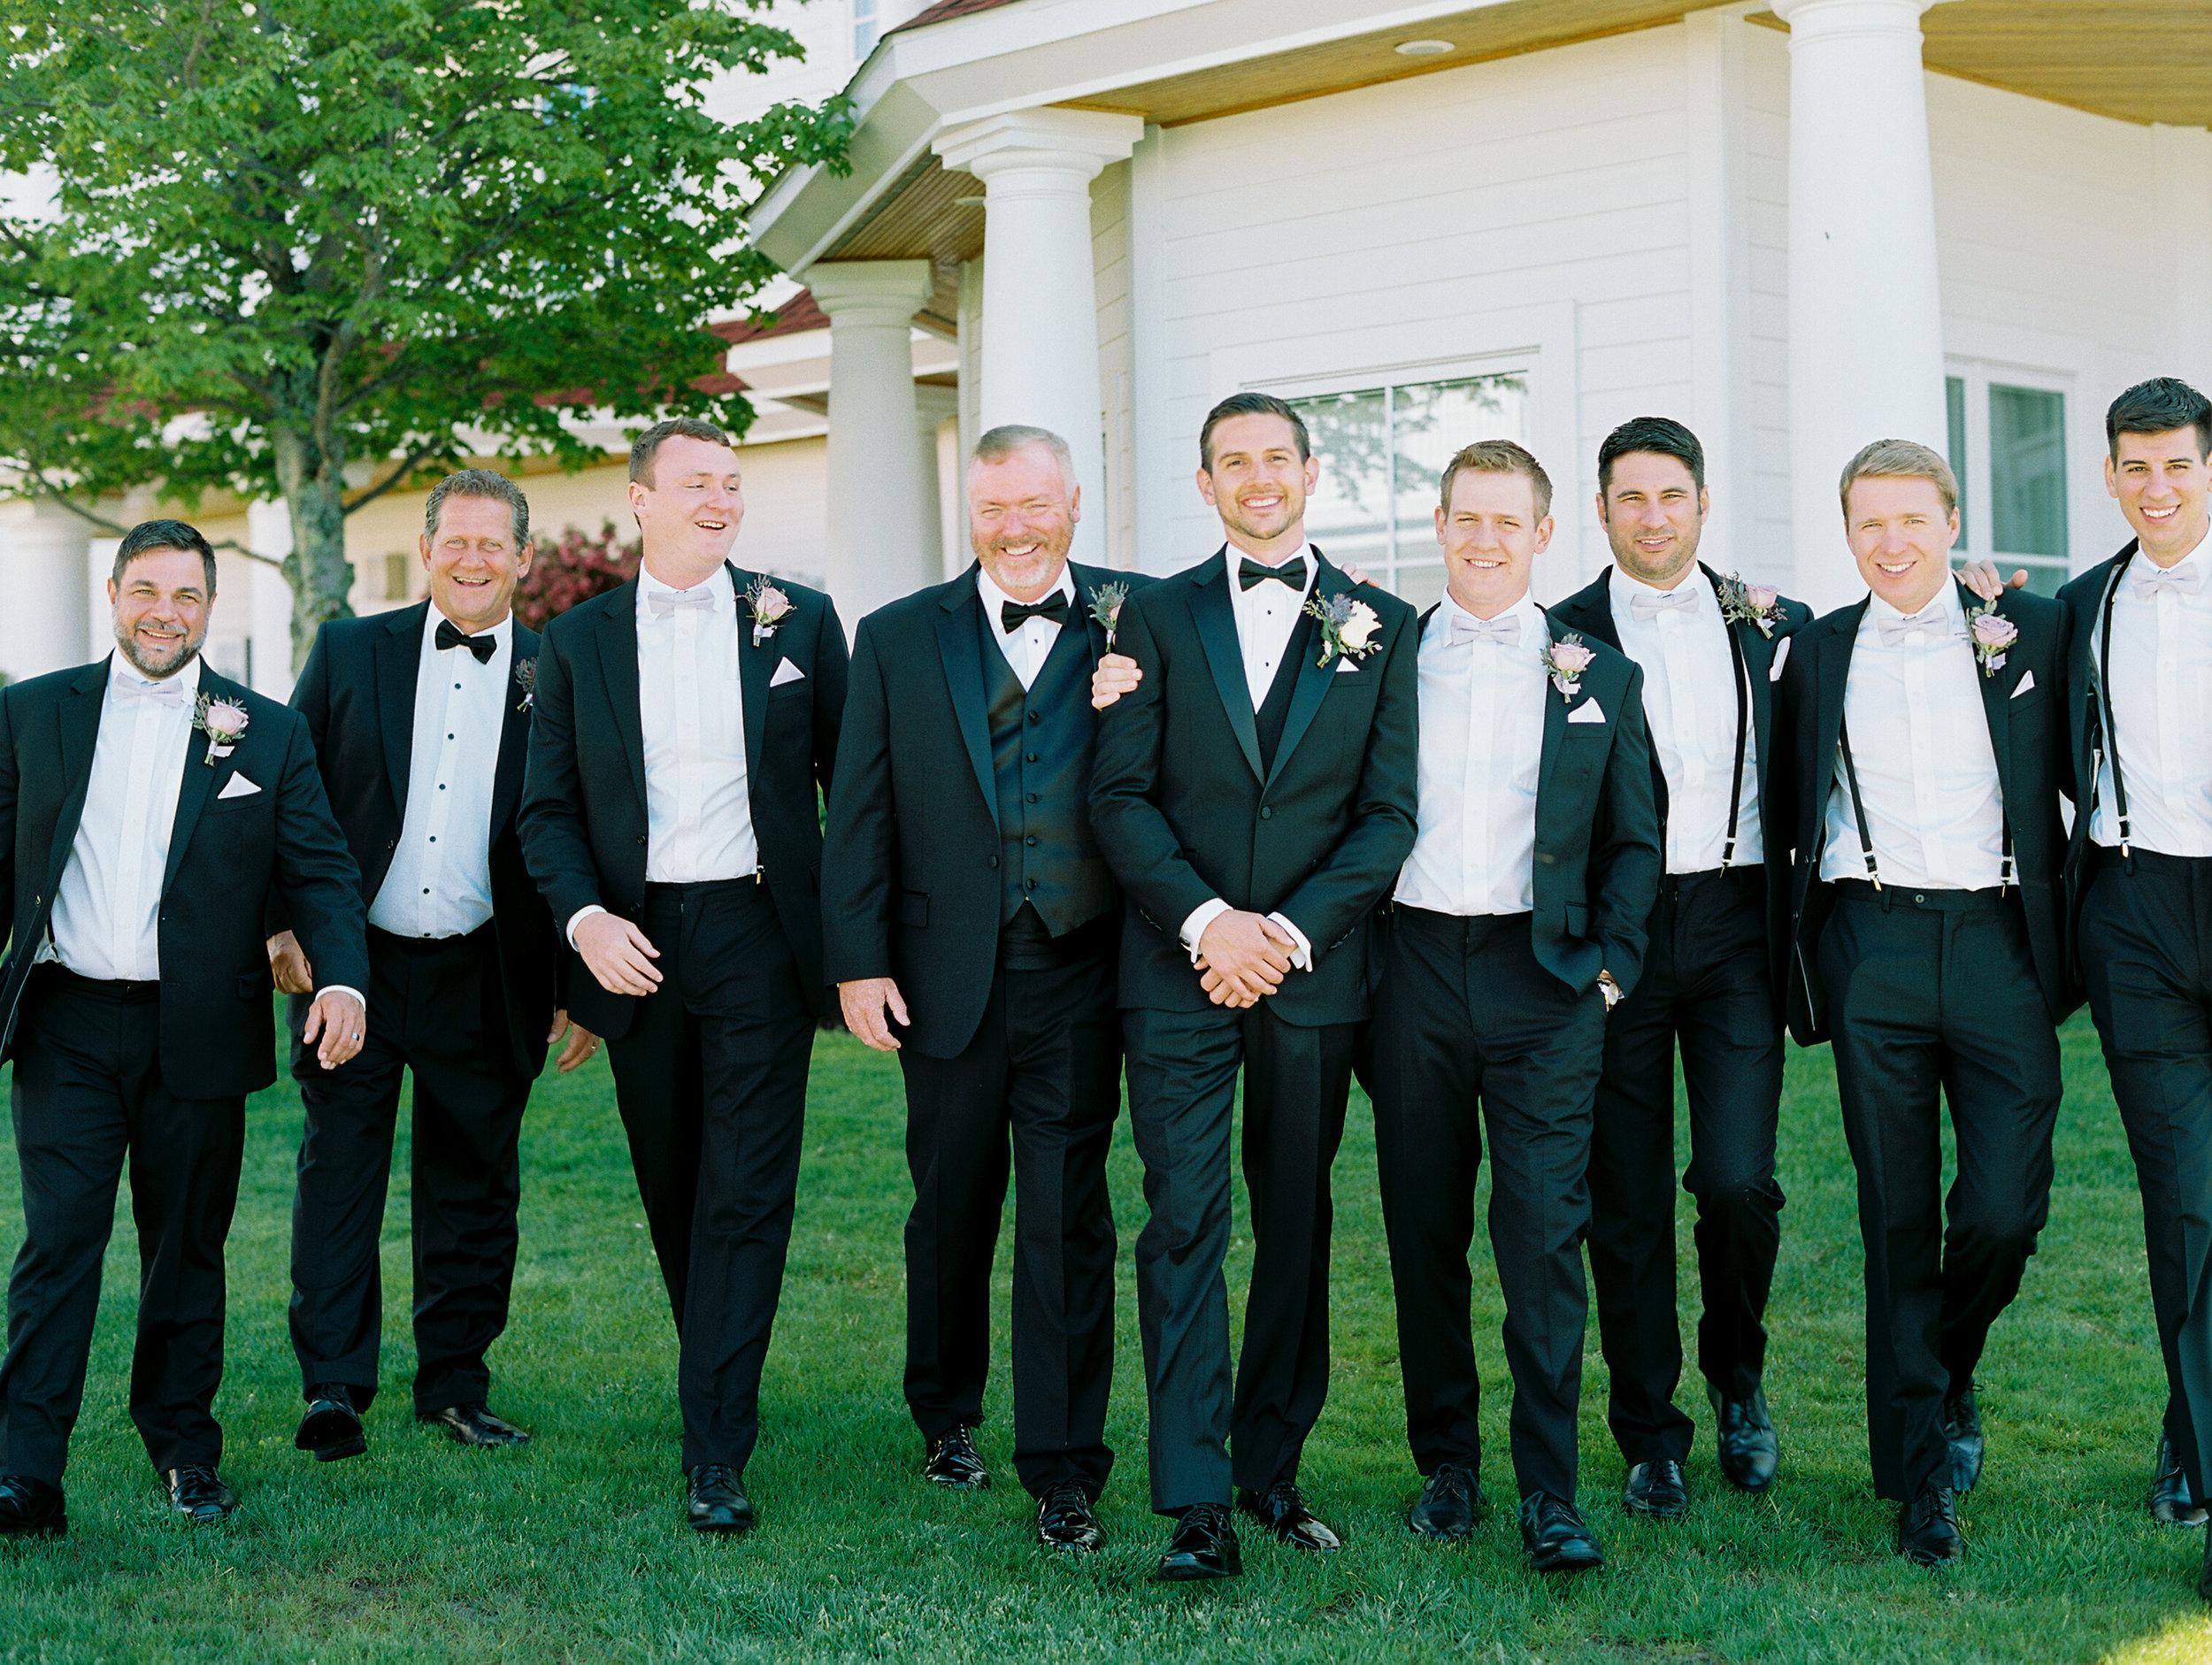 Noss+Wedding+Groom+Groomsmen-33.jpg